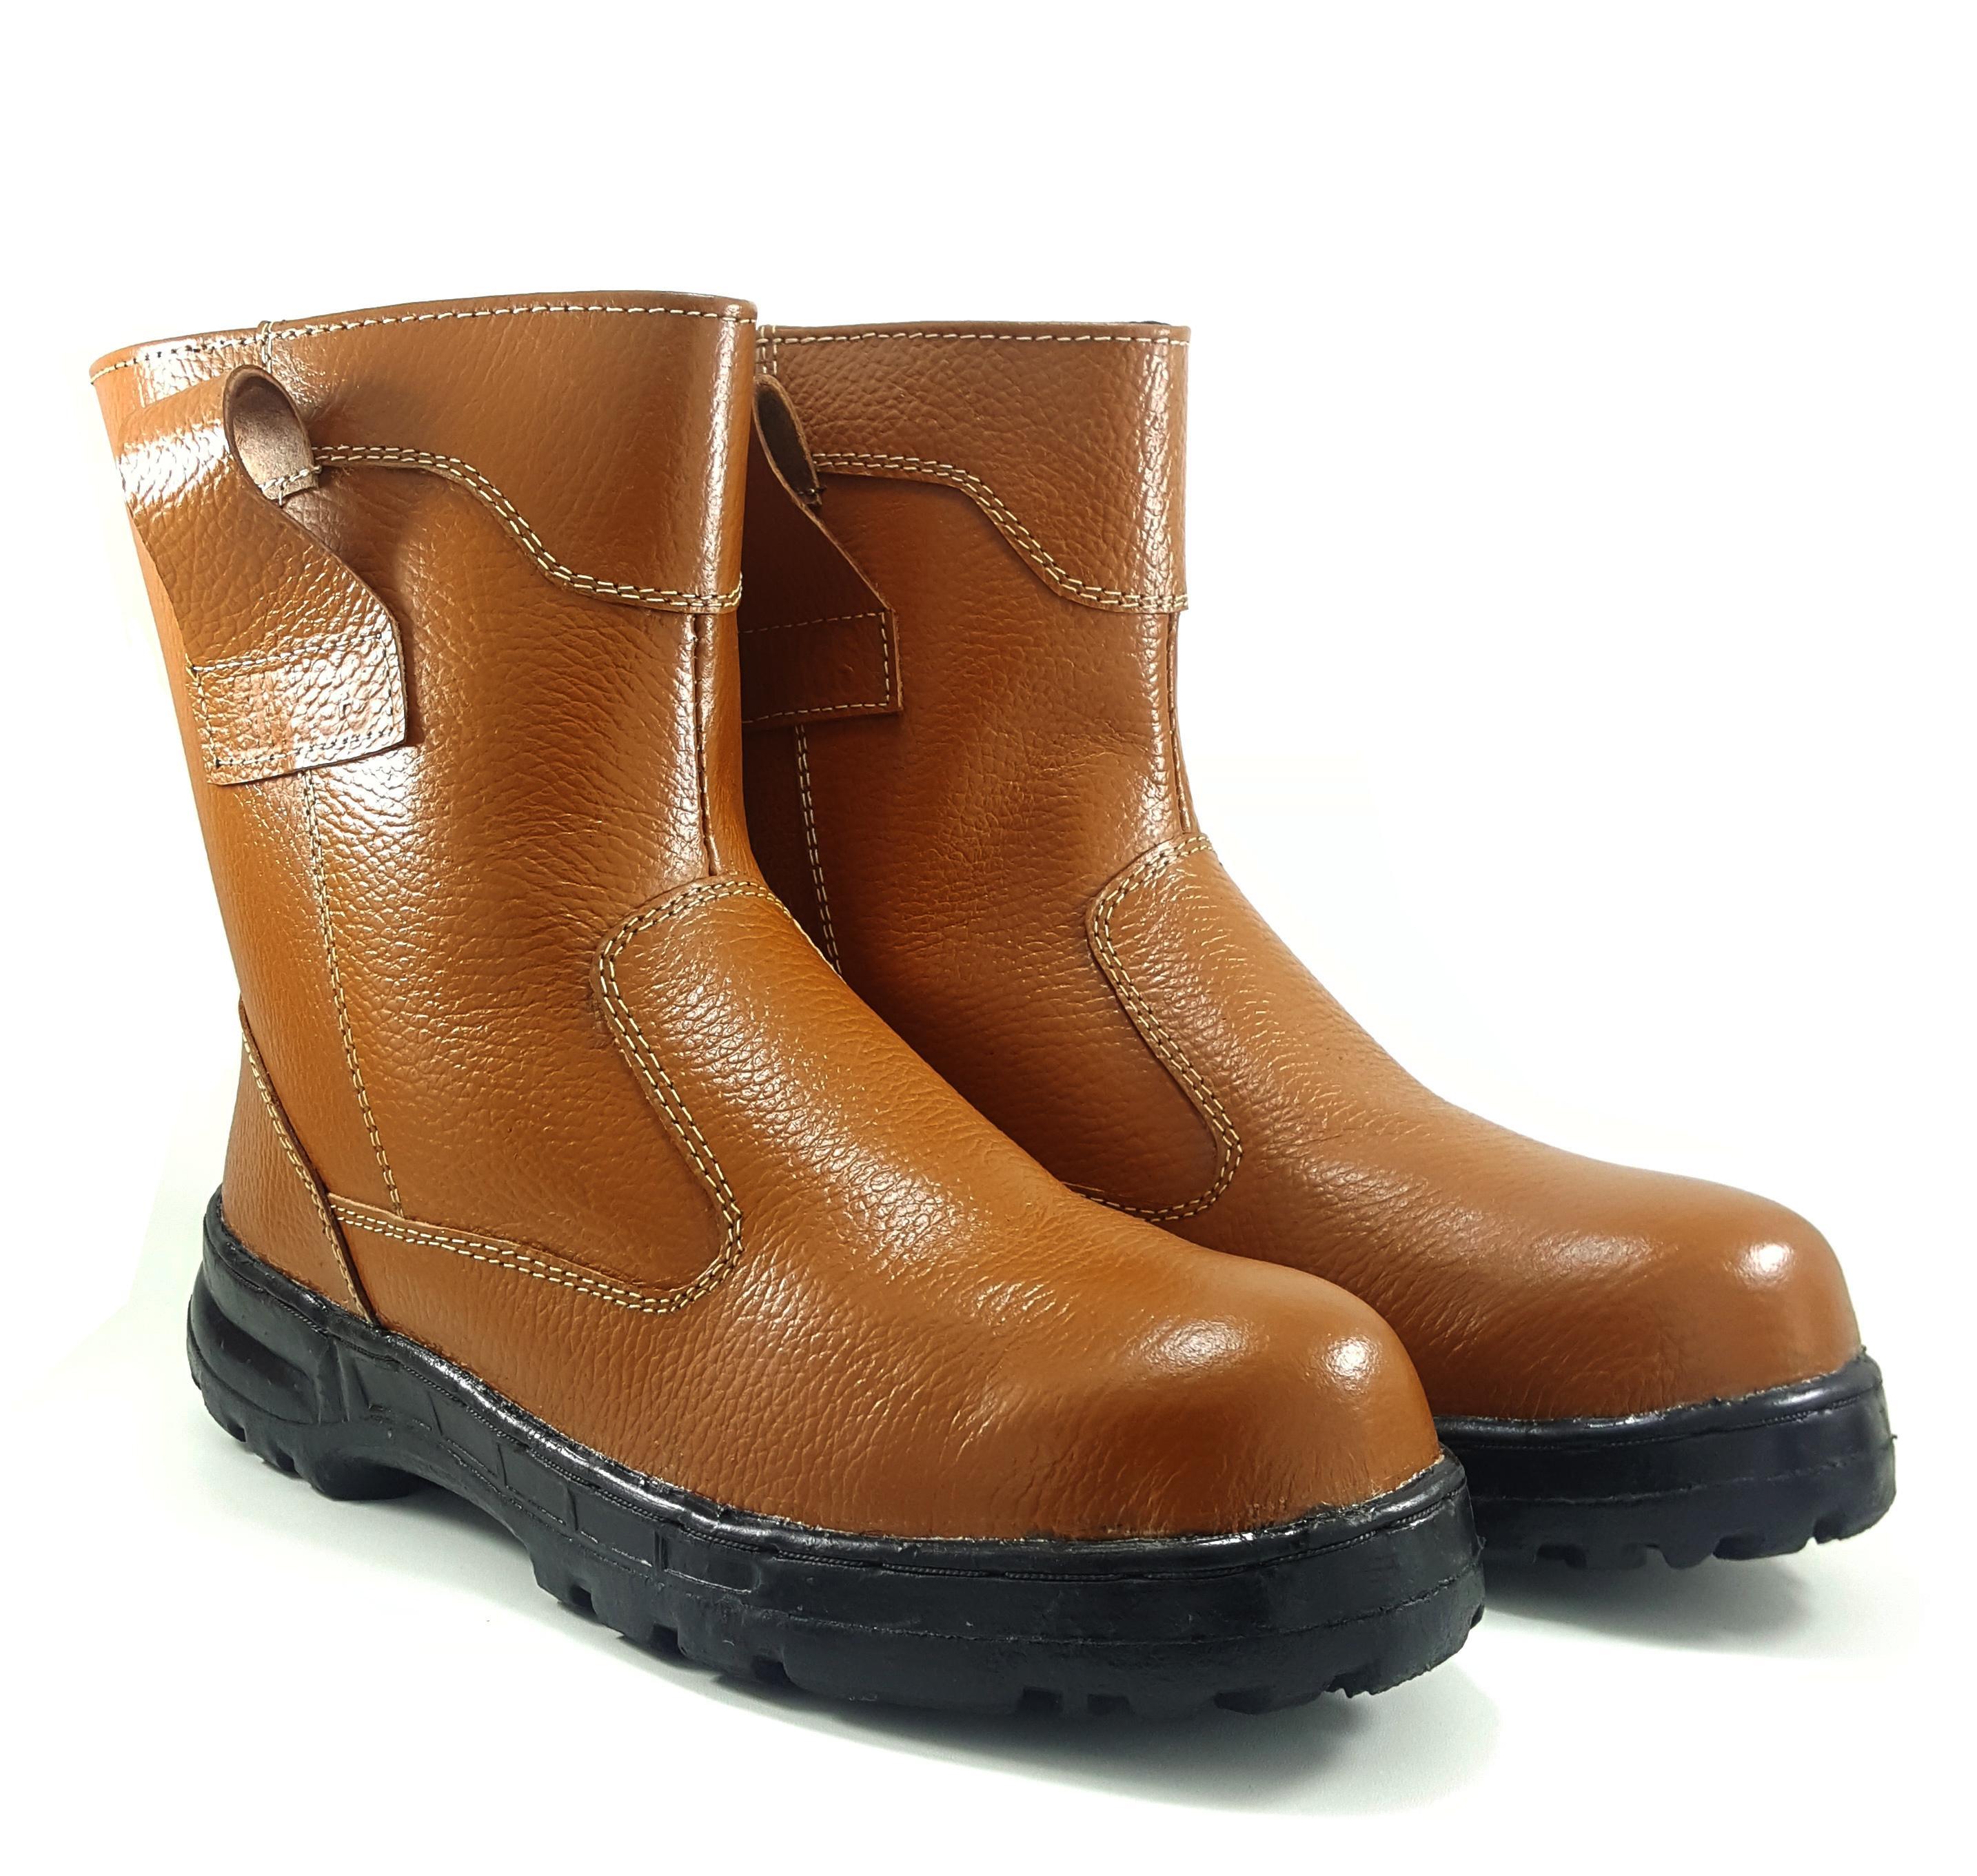 Sepatu Boots Safety Asli Kulit King Arthur